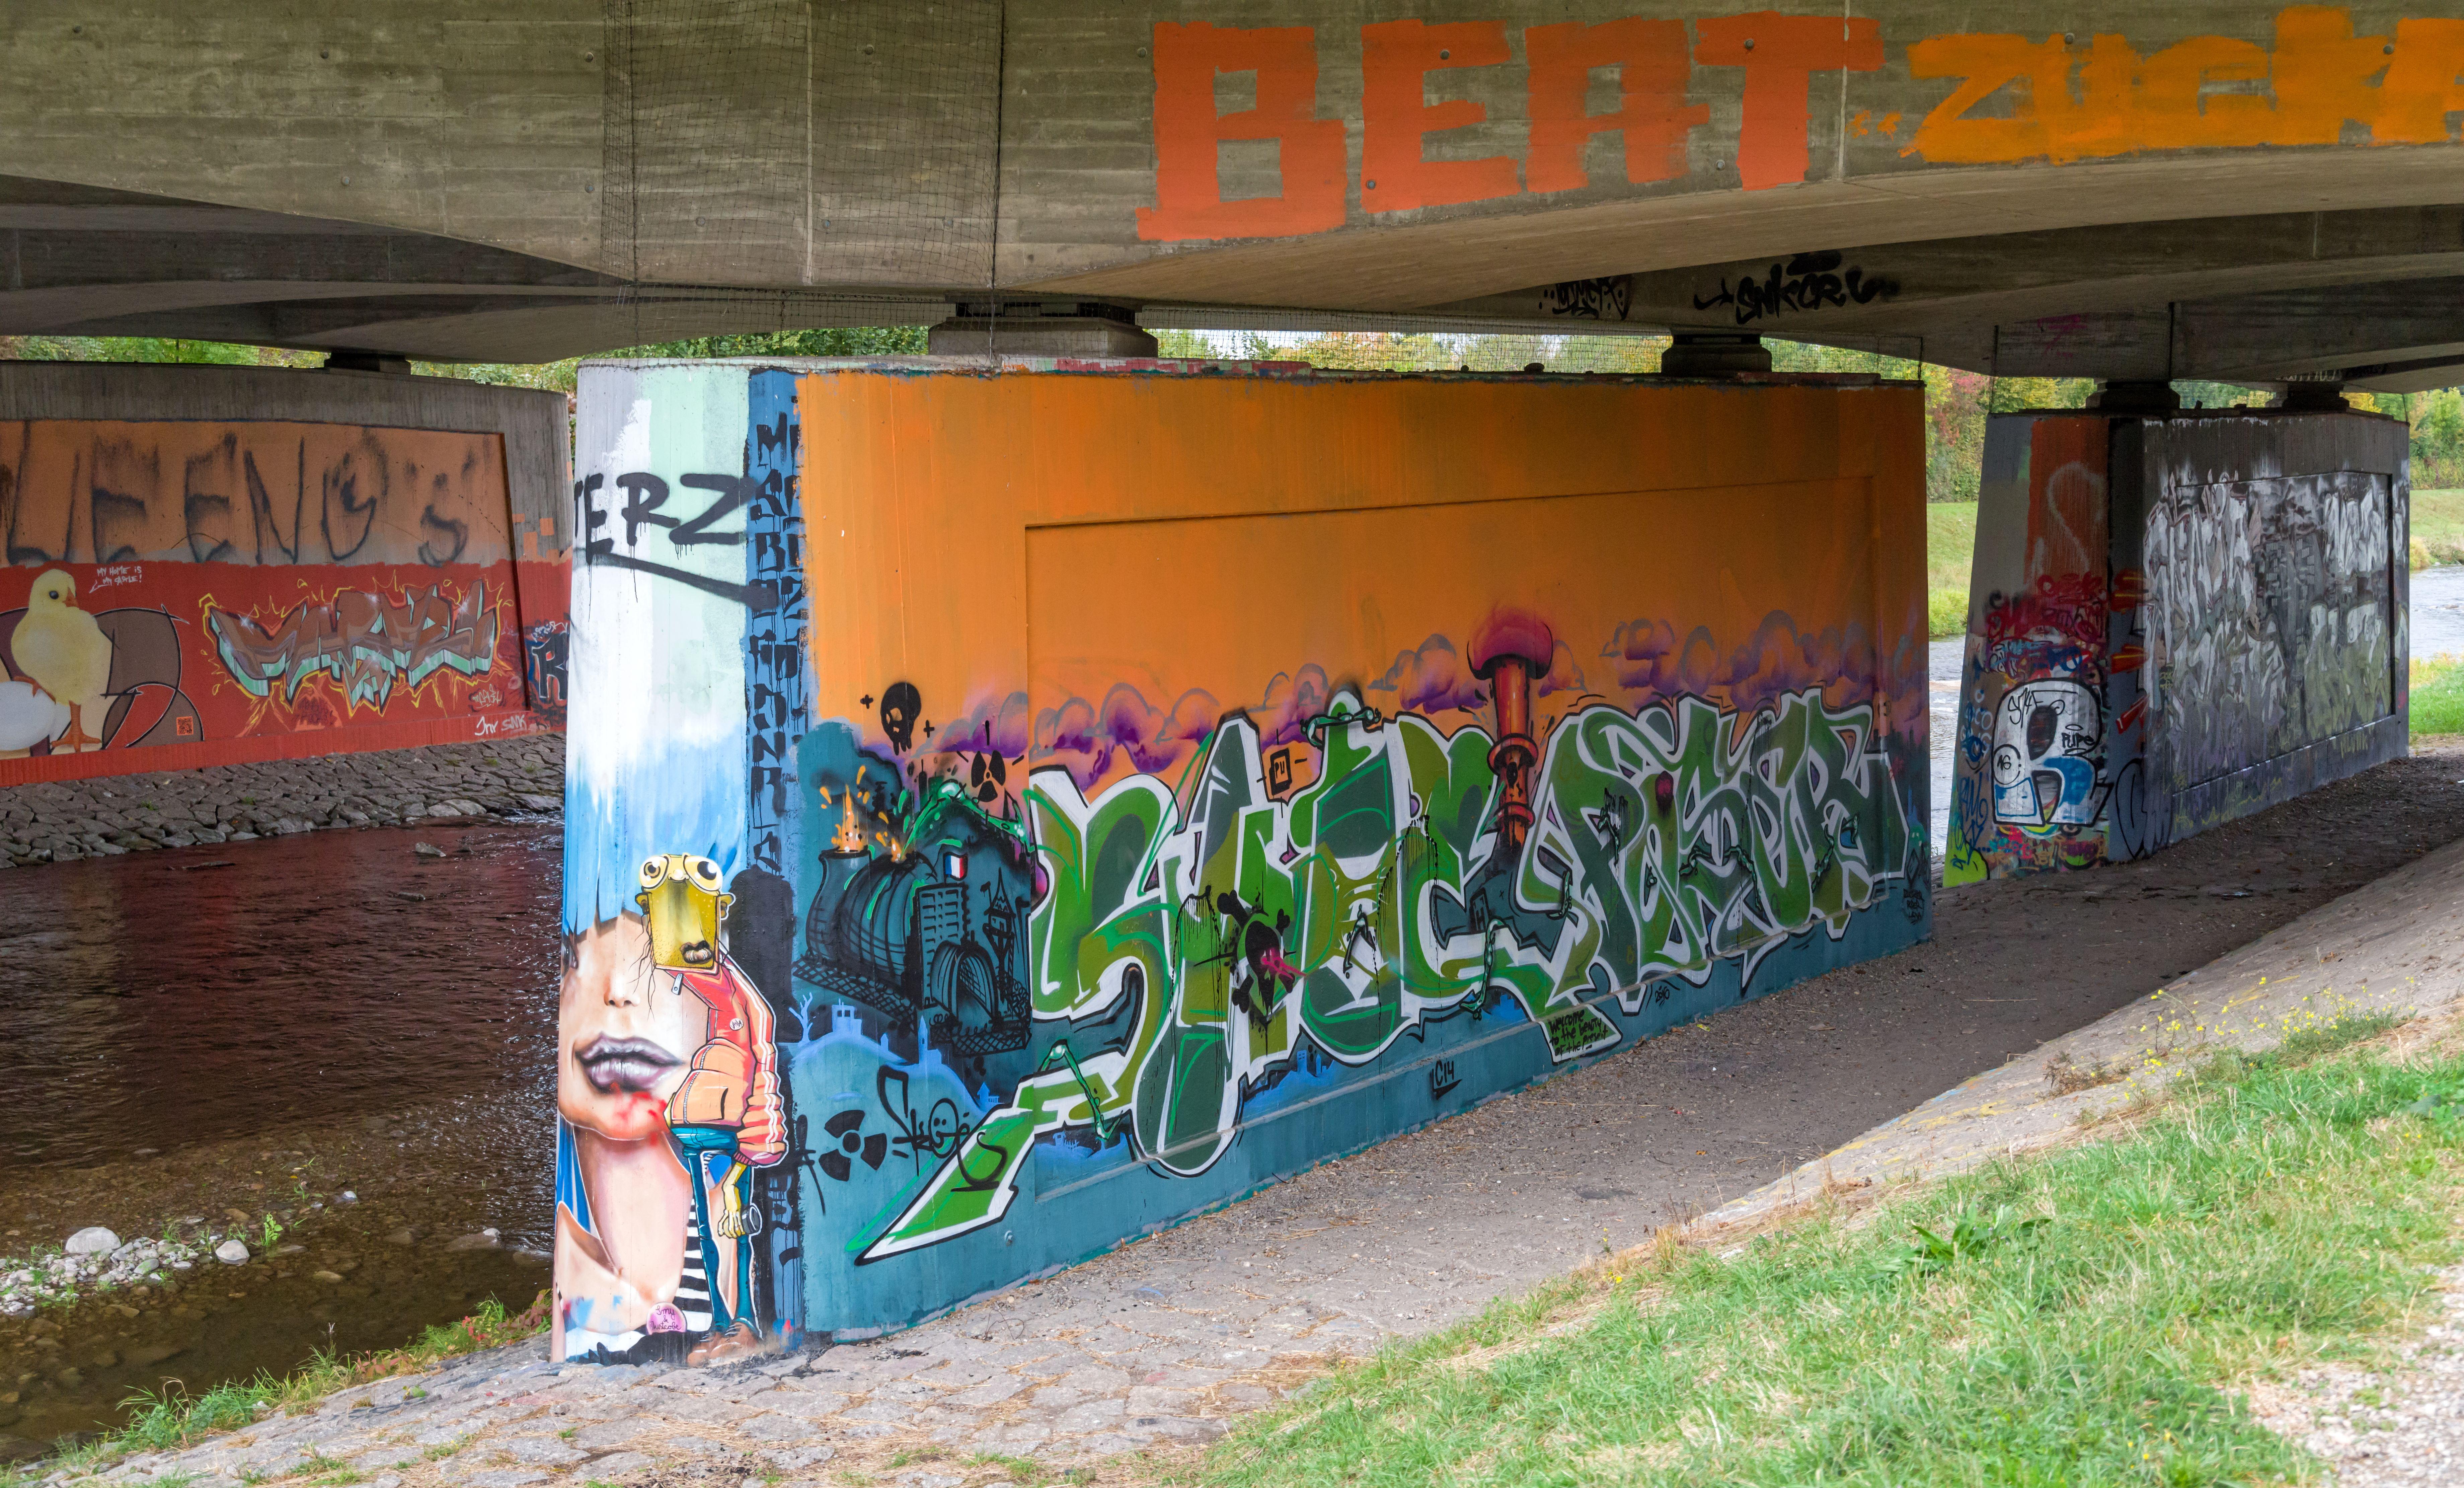 Filegraffiti Hermann Zens Brücke Freiburg Im Breisgau Jm22975jpg